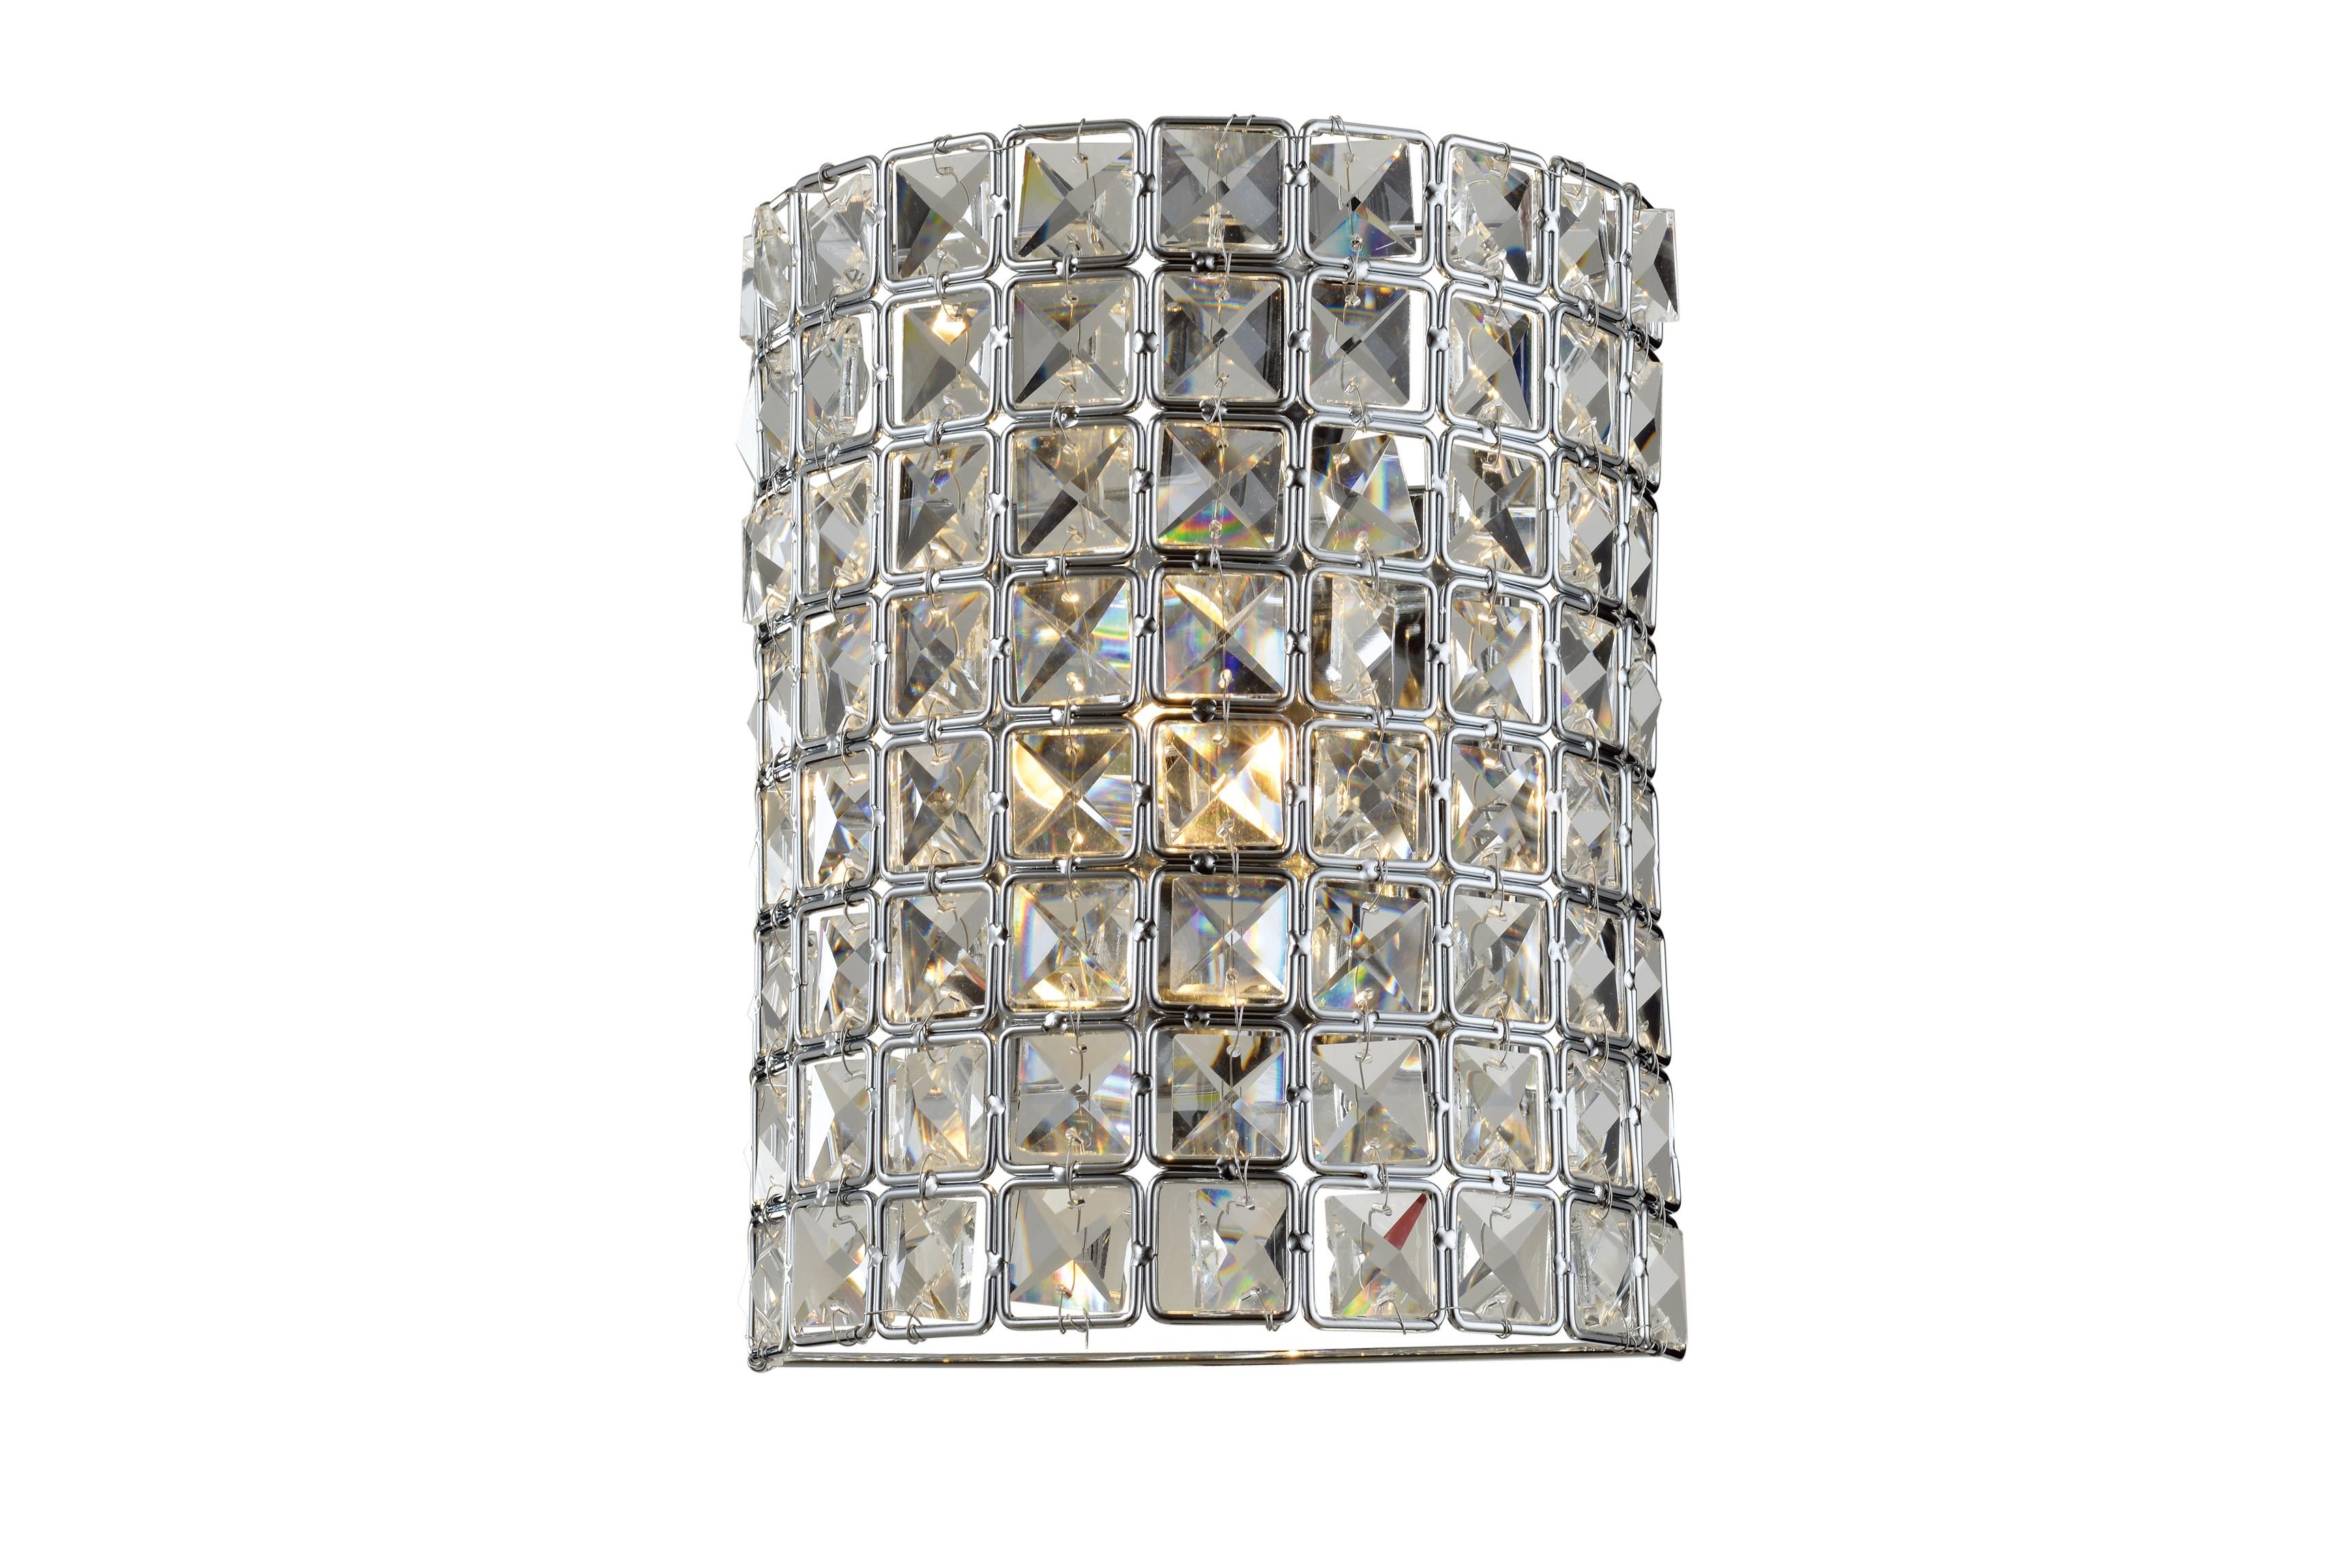 Arandela de Cristal LX I Transparente 1 Lâmpada